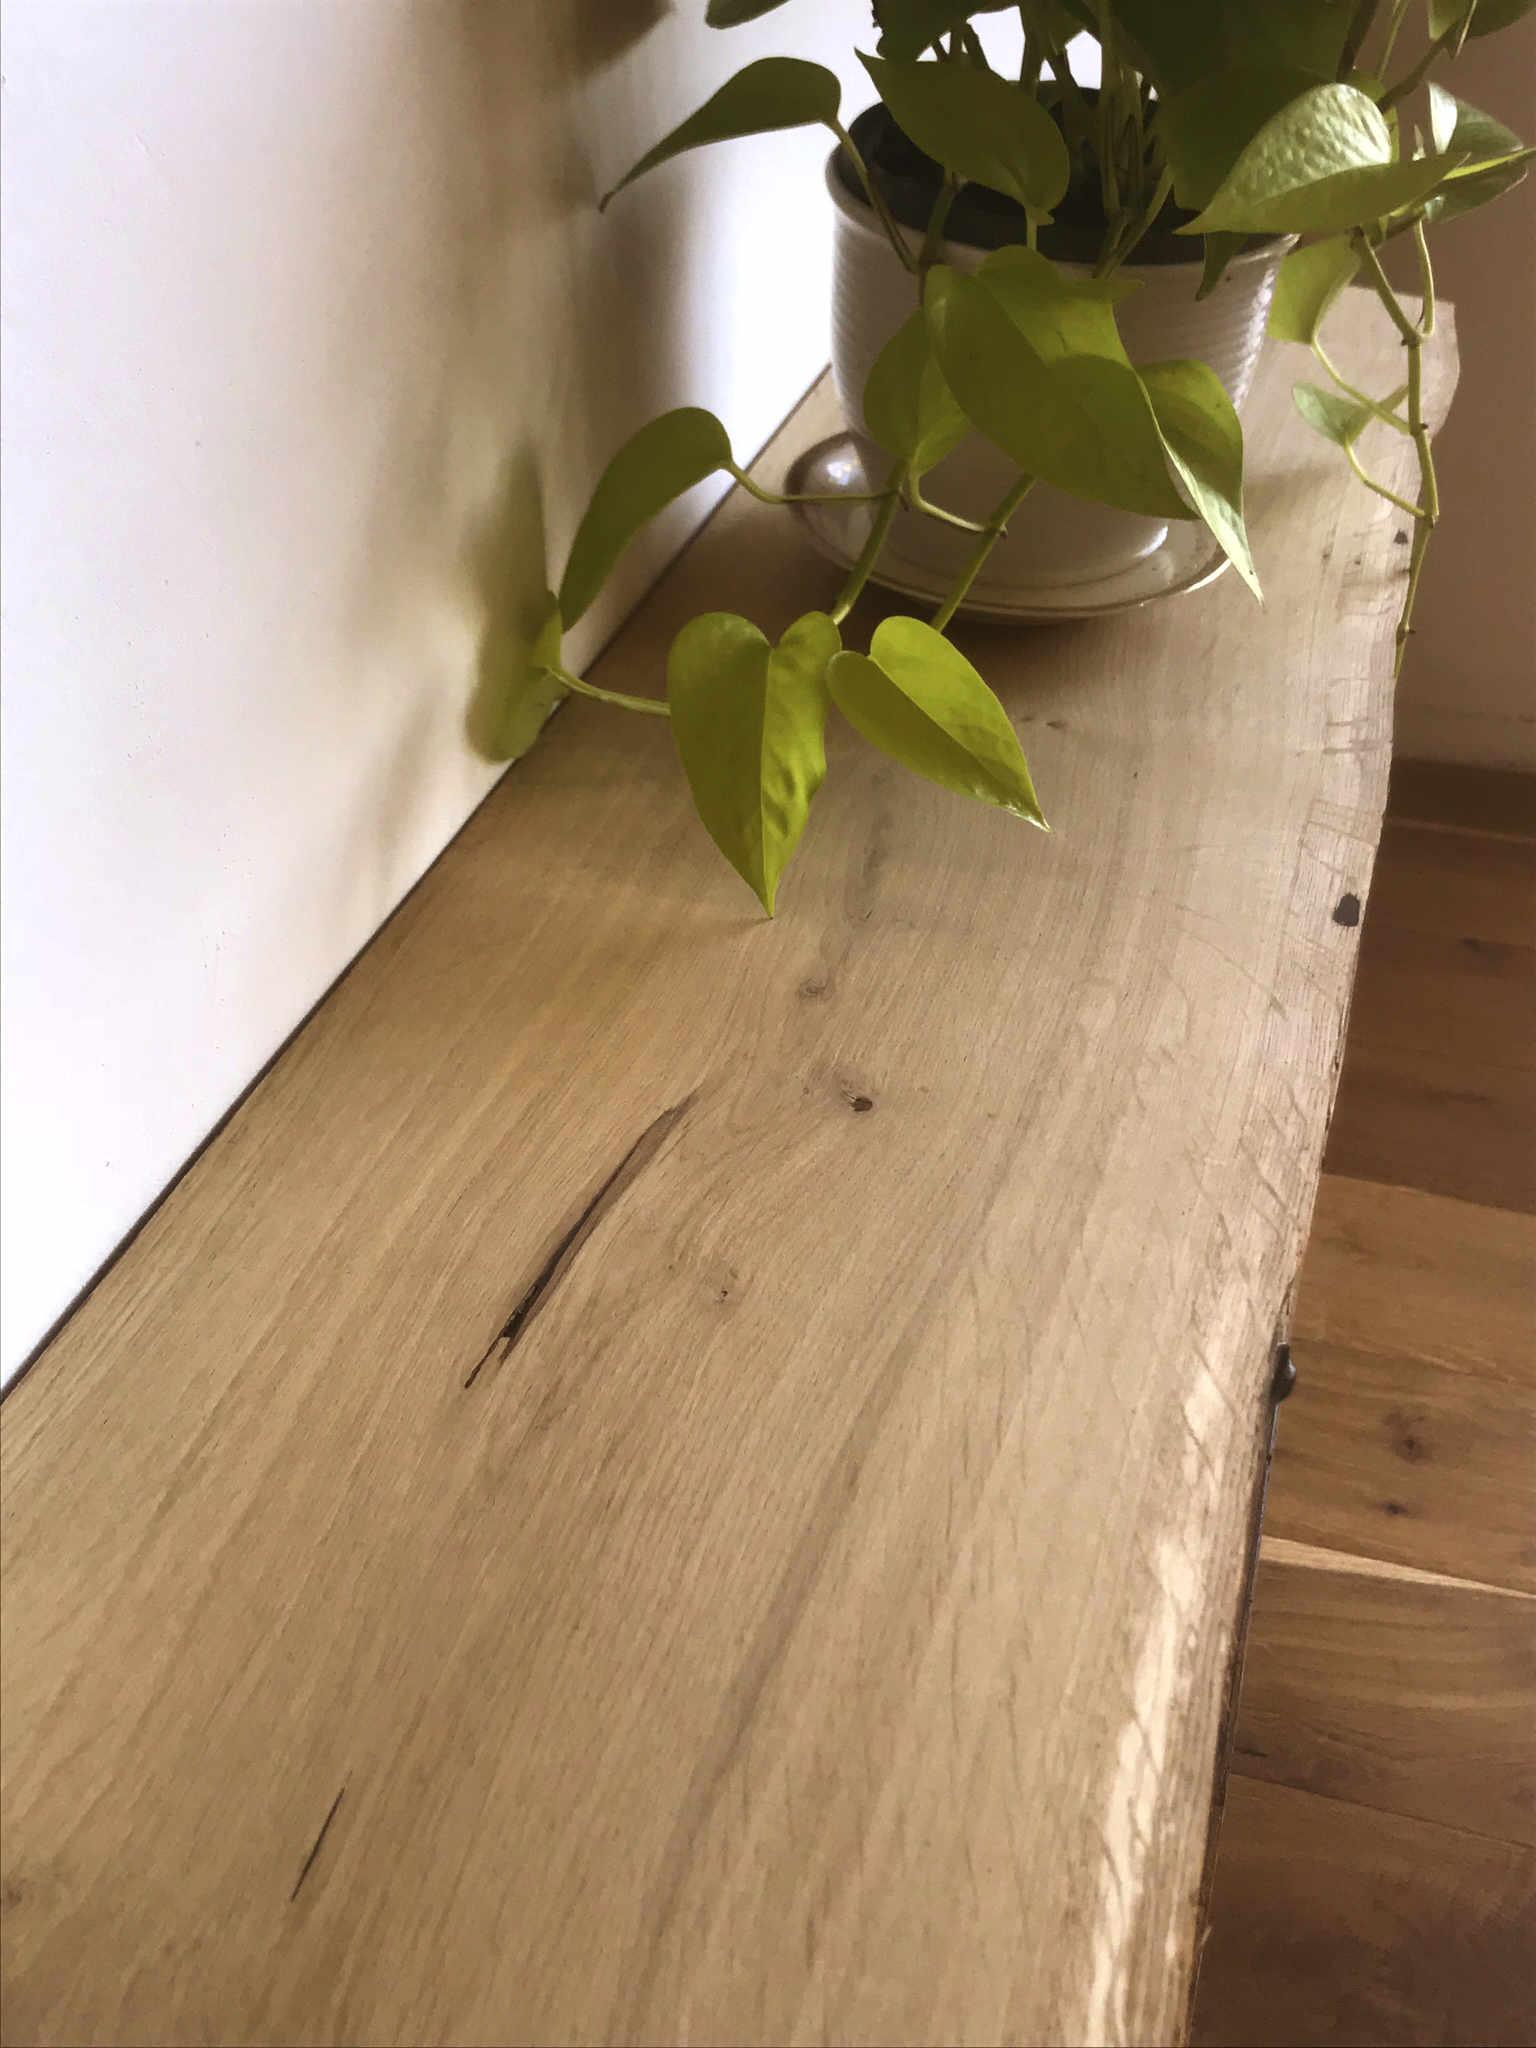 online retailer 0240c bbc08 Floating Shelves   Timber Shelving   Decorative Oak Shelves